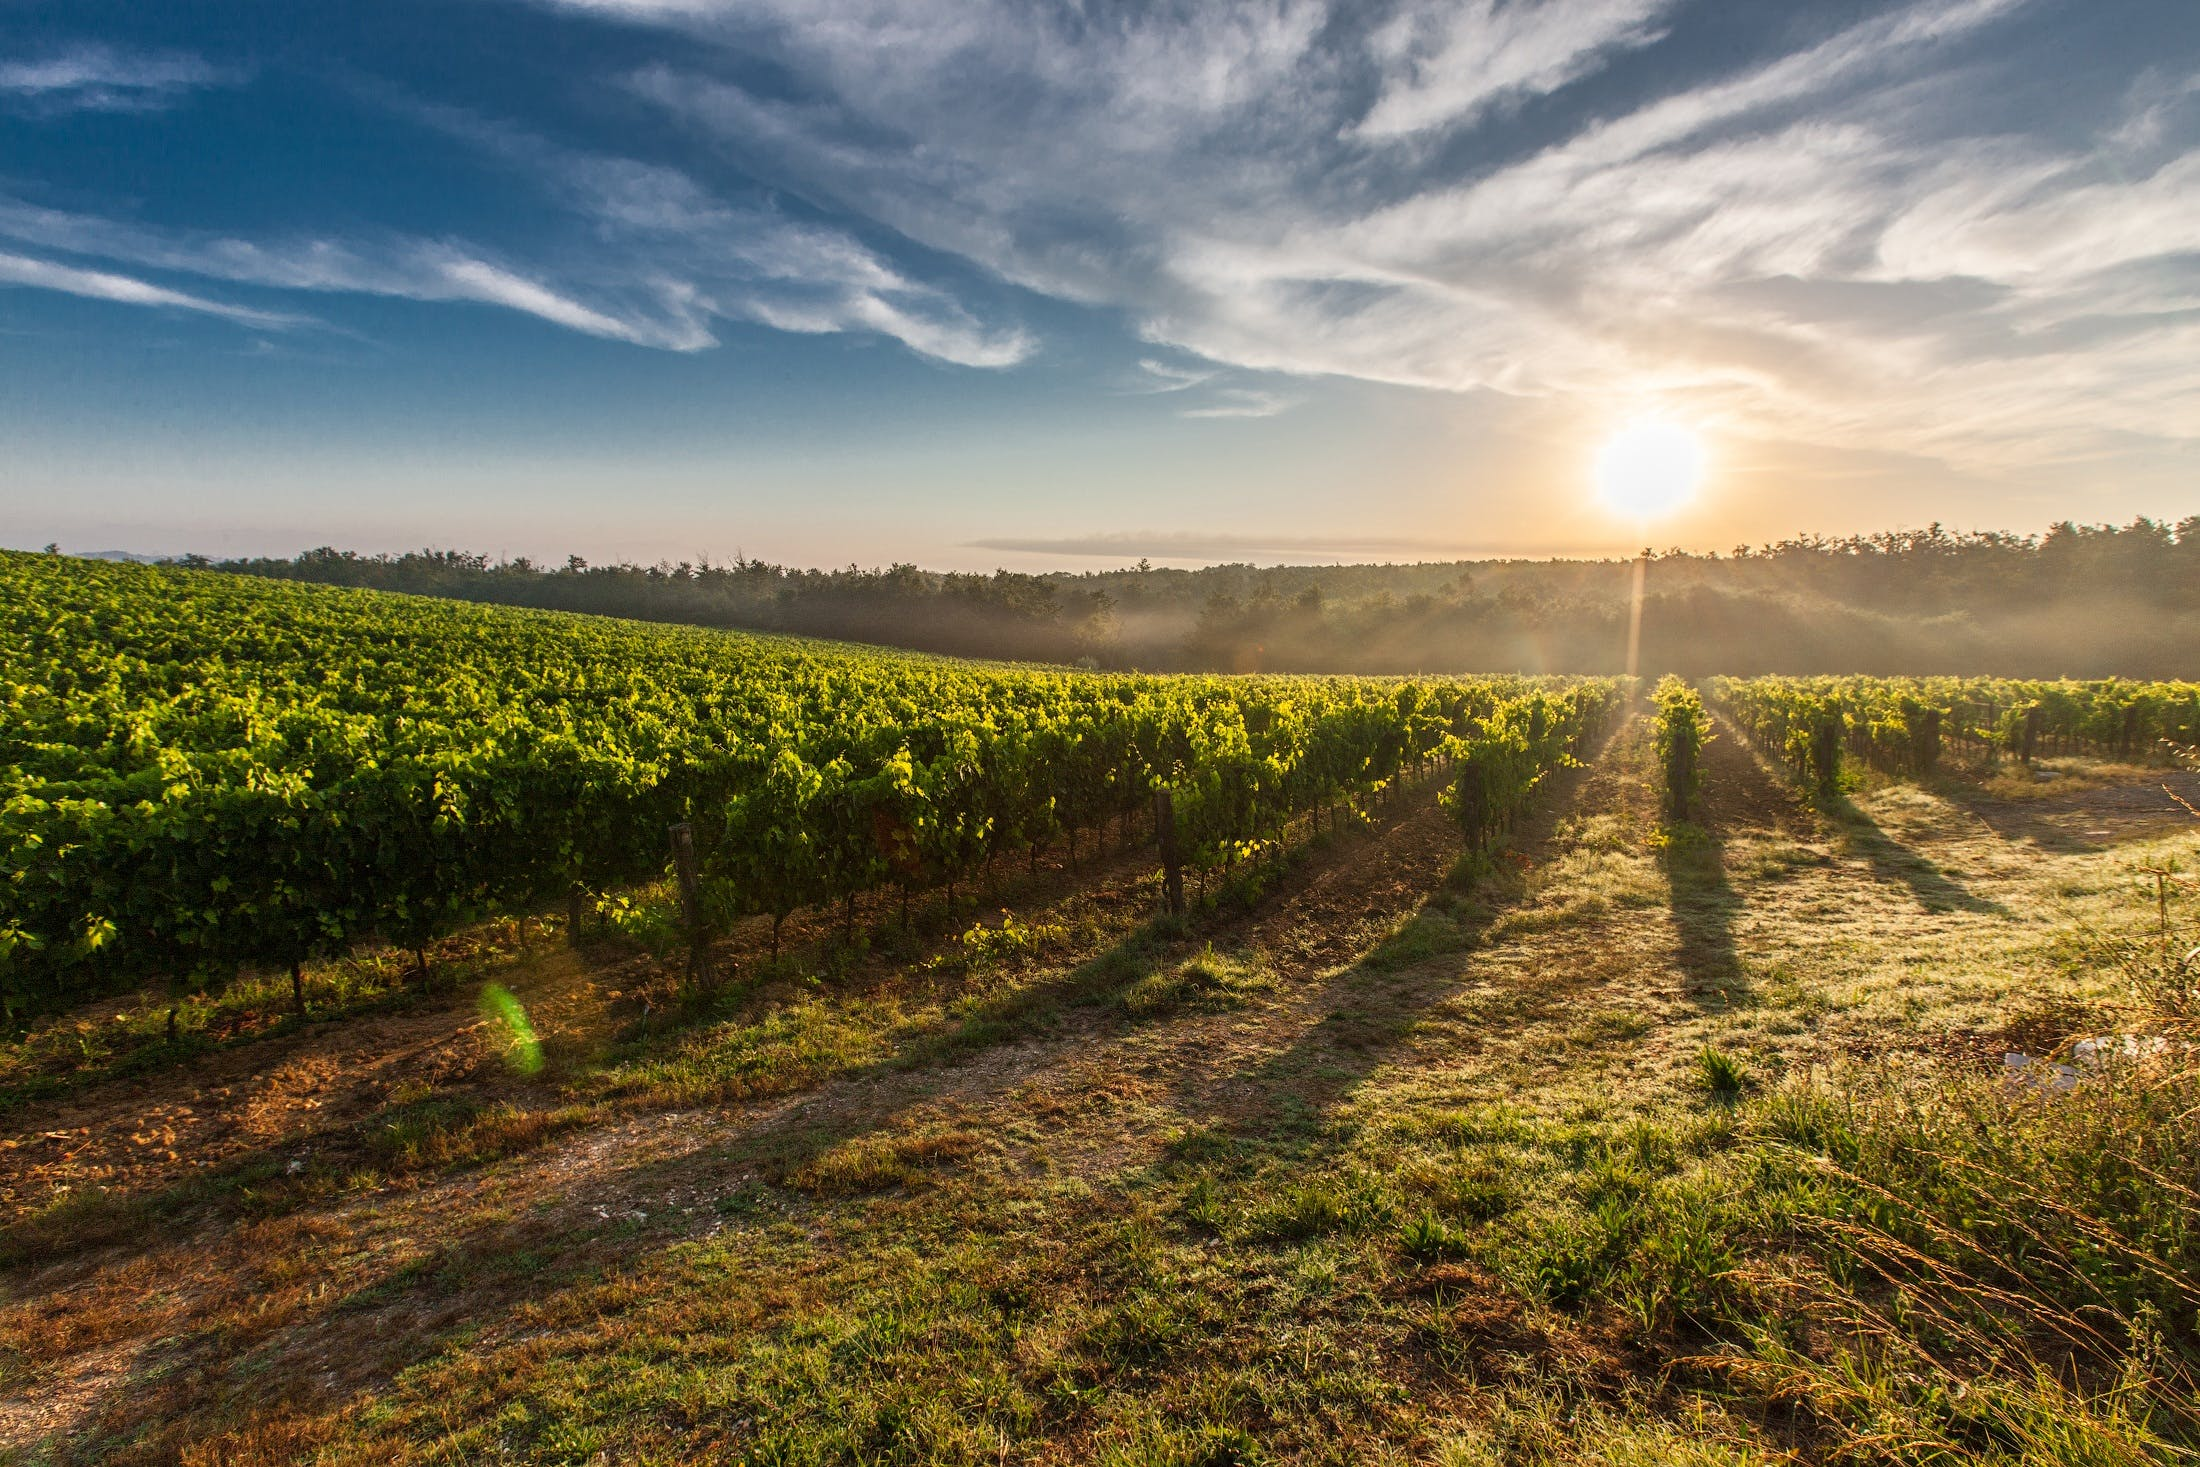 Farm Land during Sunset